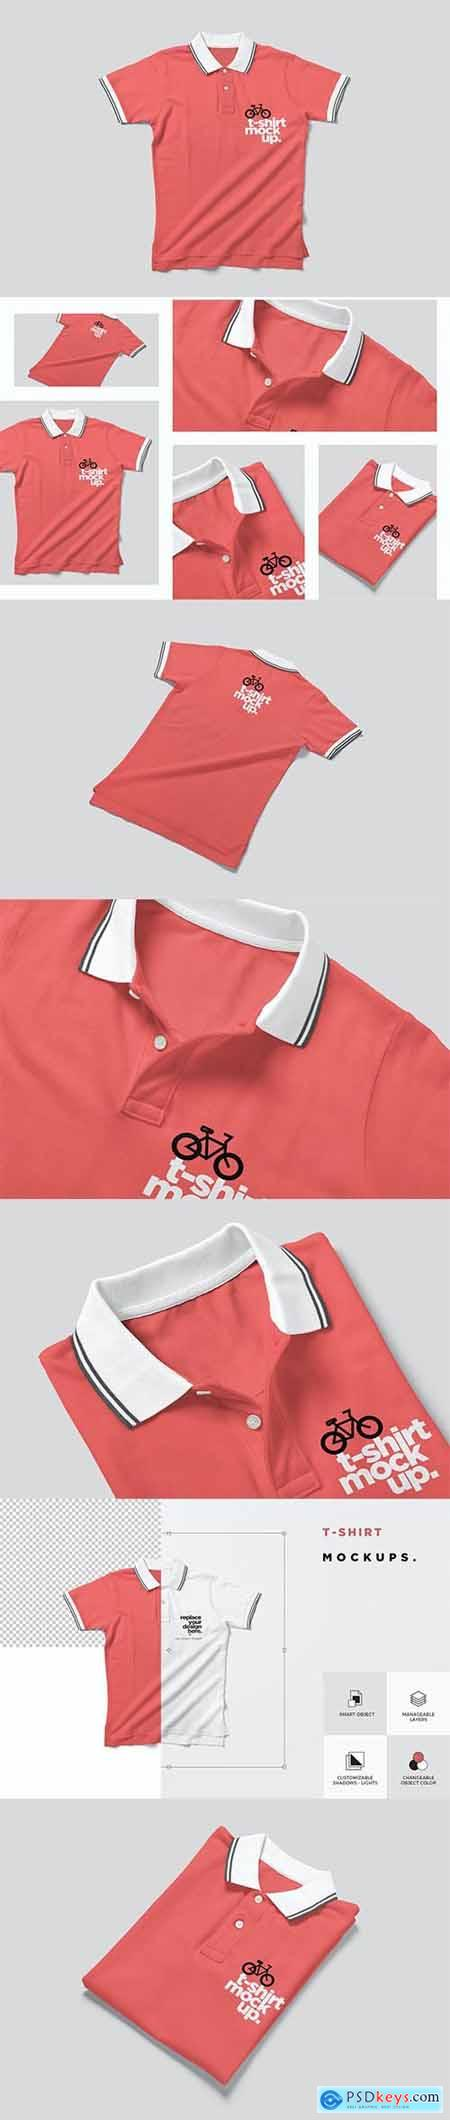 Collar T-shirt Mockups